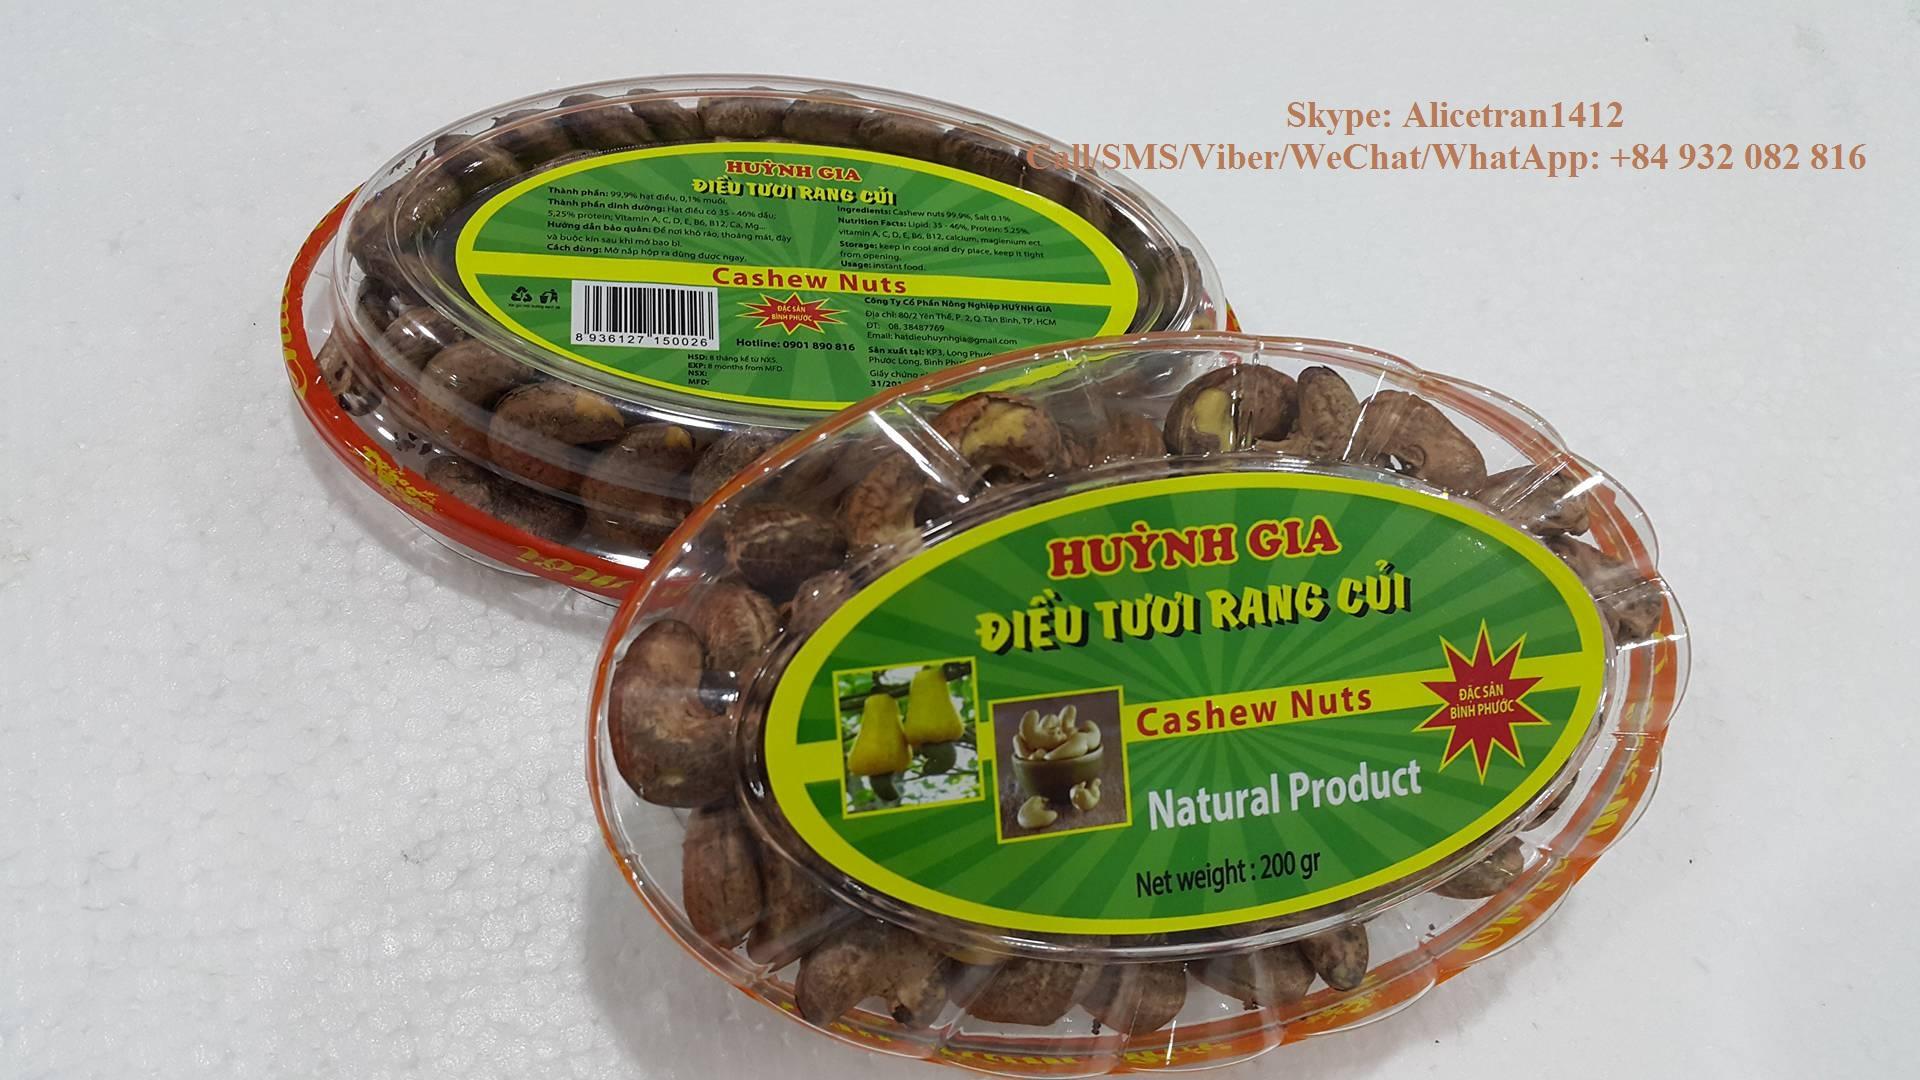 Cashew Nuts From Vietnam